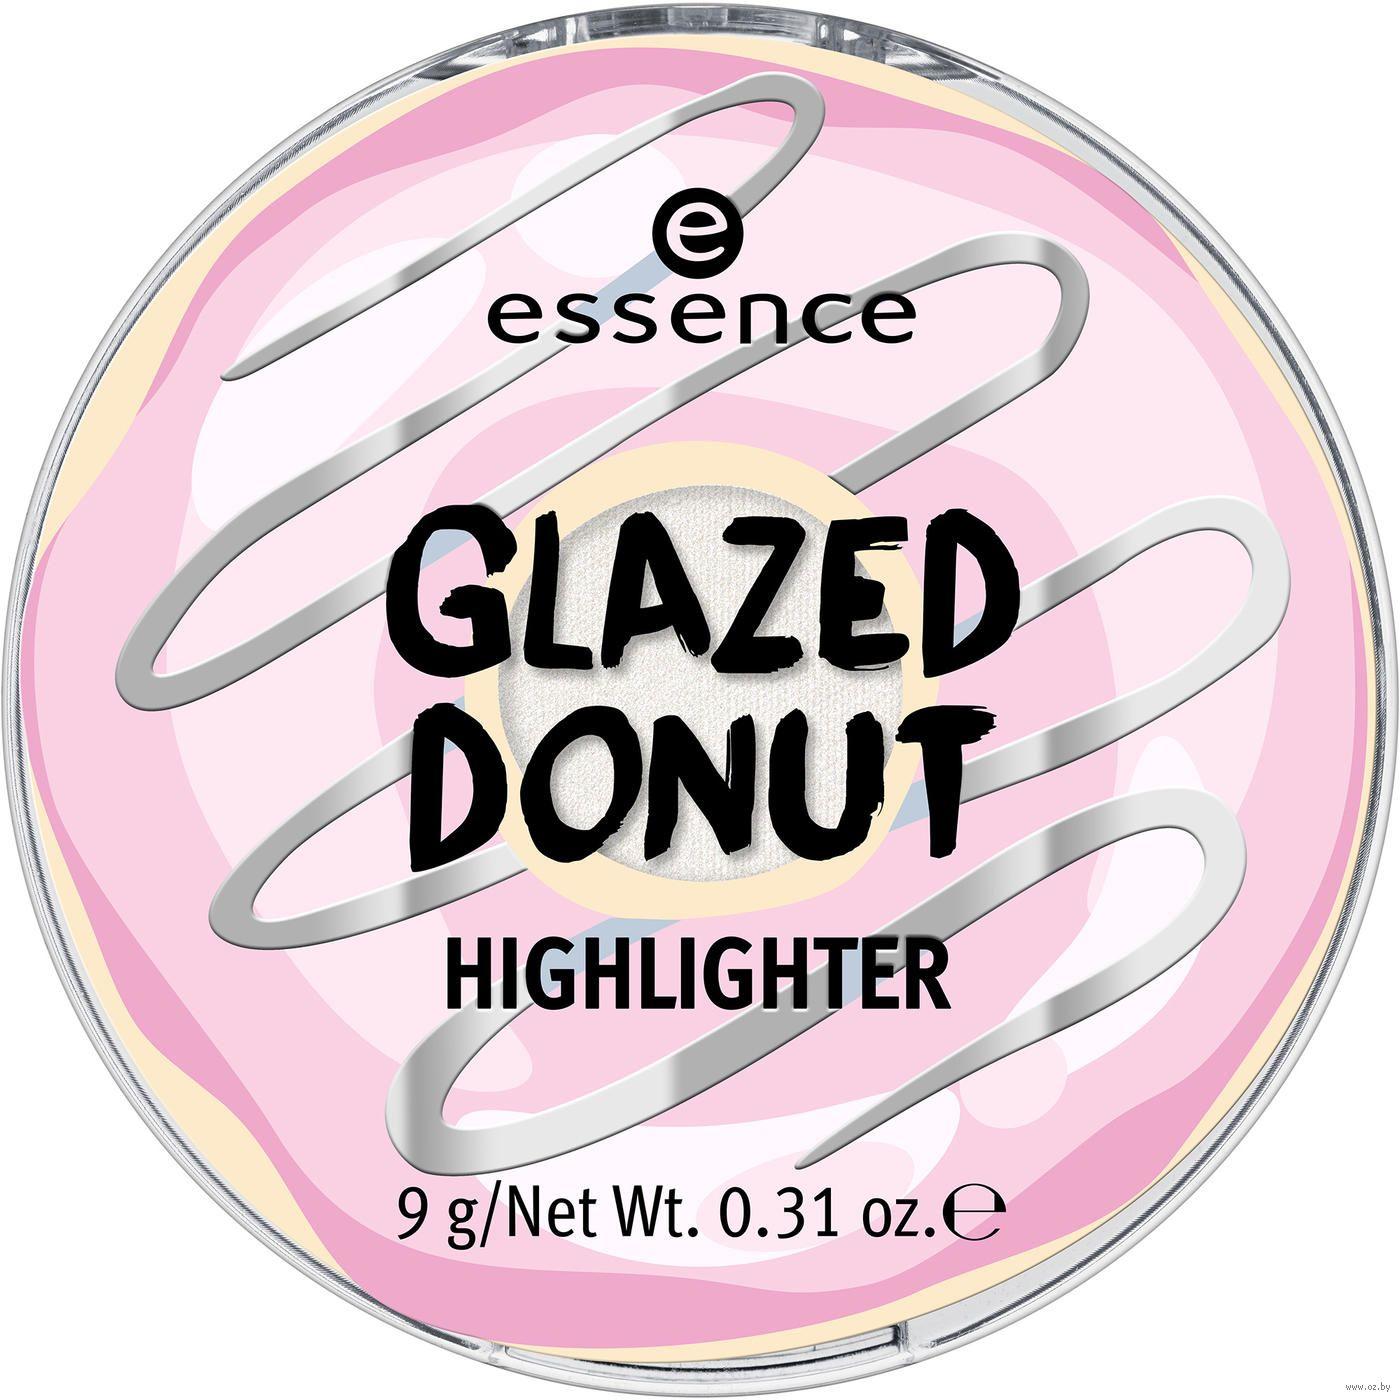 Хайлайтер Essence «Glazed Donut»  купить хайлайтер Эссенс в Минске в  интернет-магазине — OZ.by 02a3d35a003